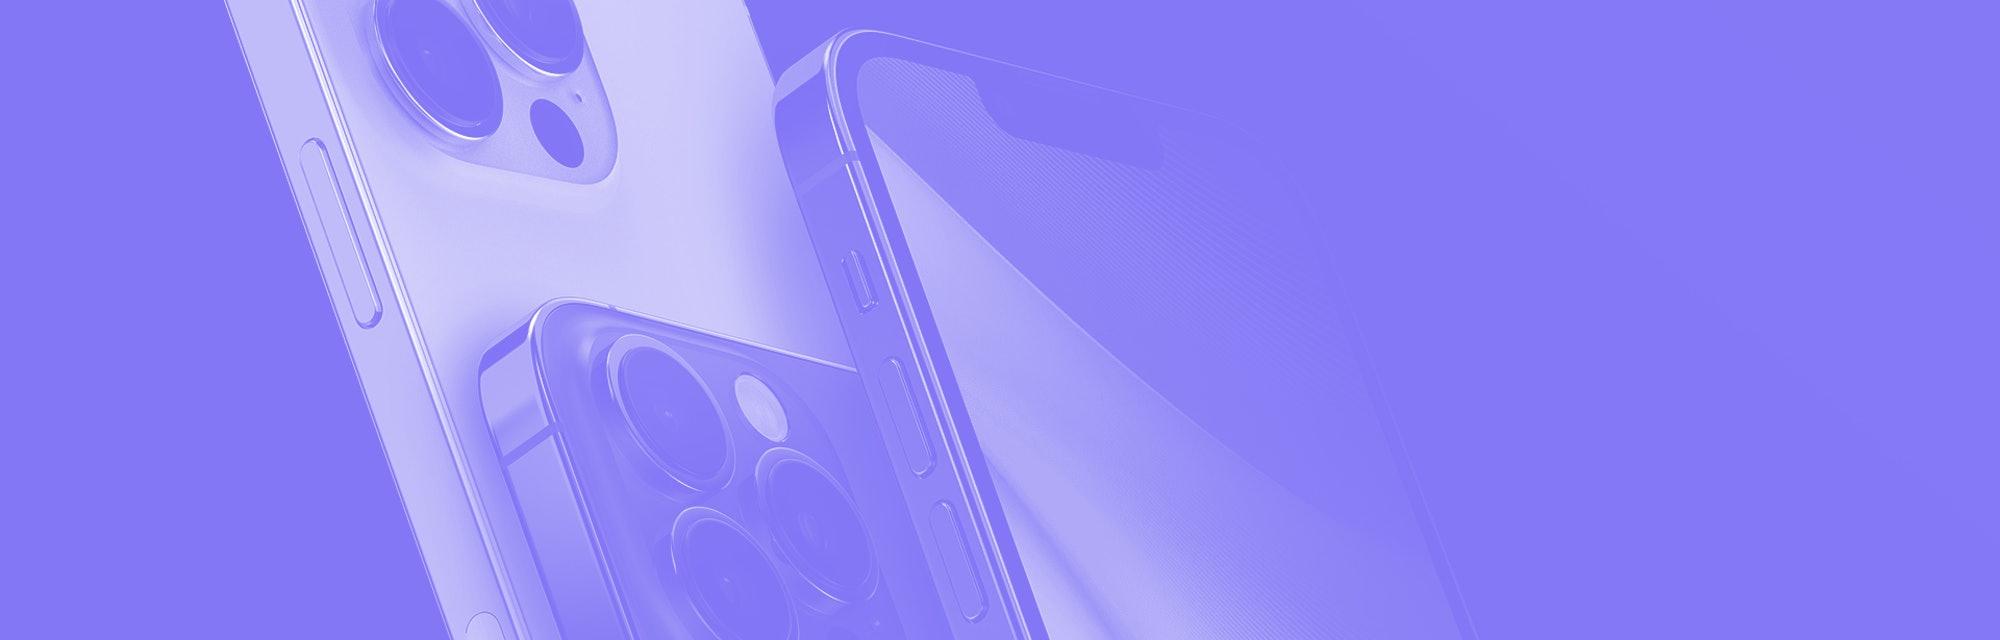 iPhone 13 Pro concept renders by Ian Zelbo